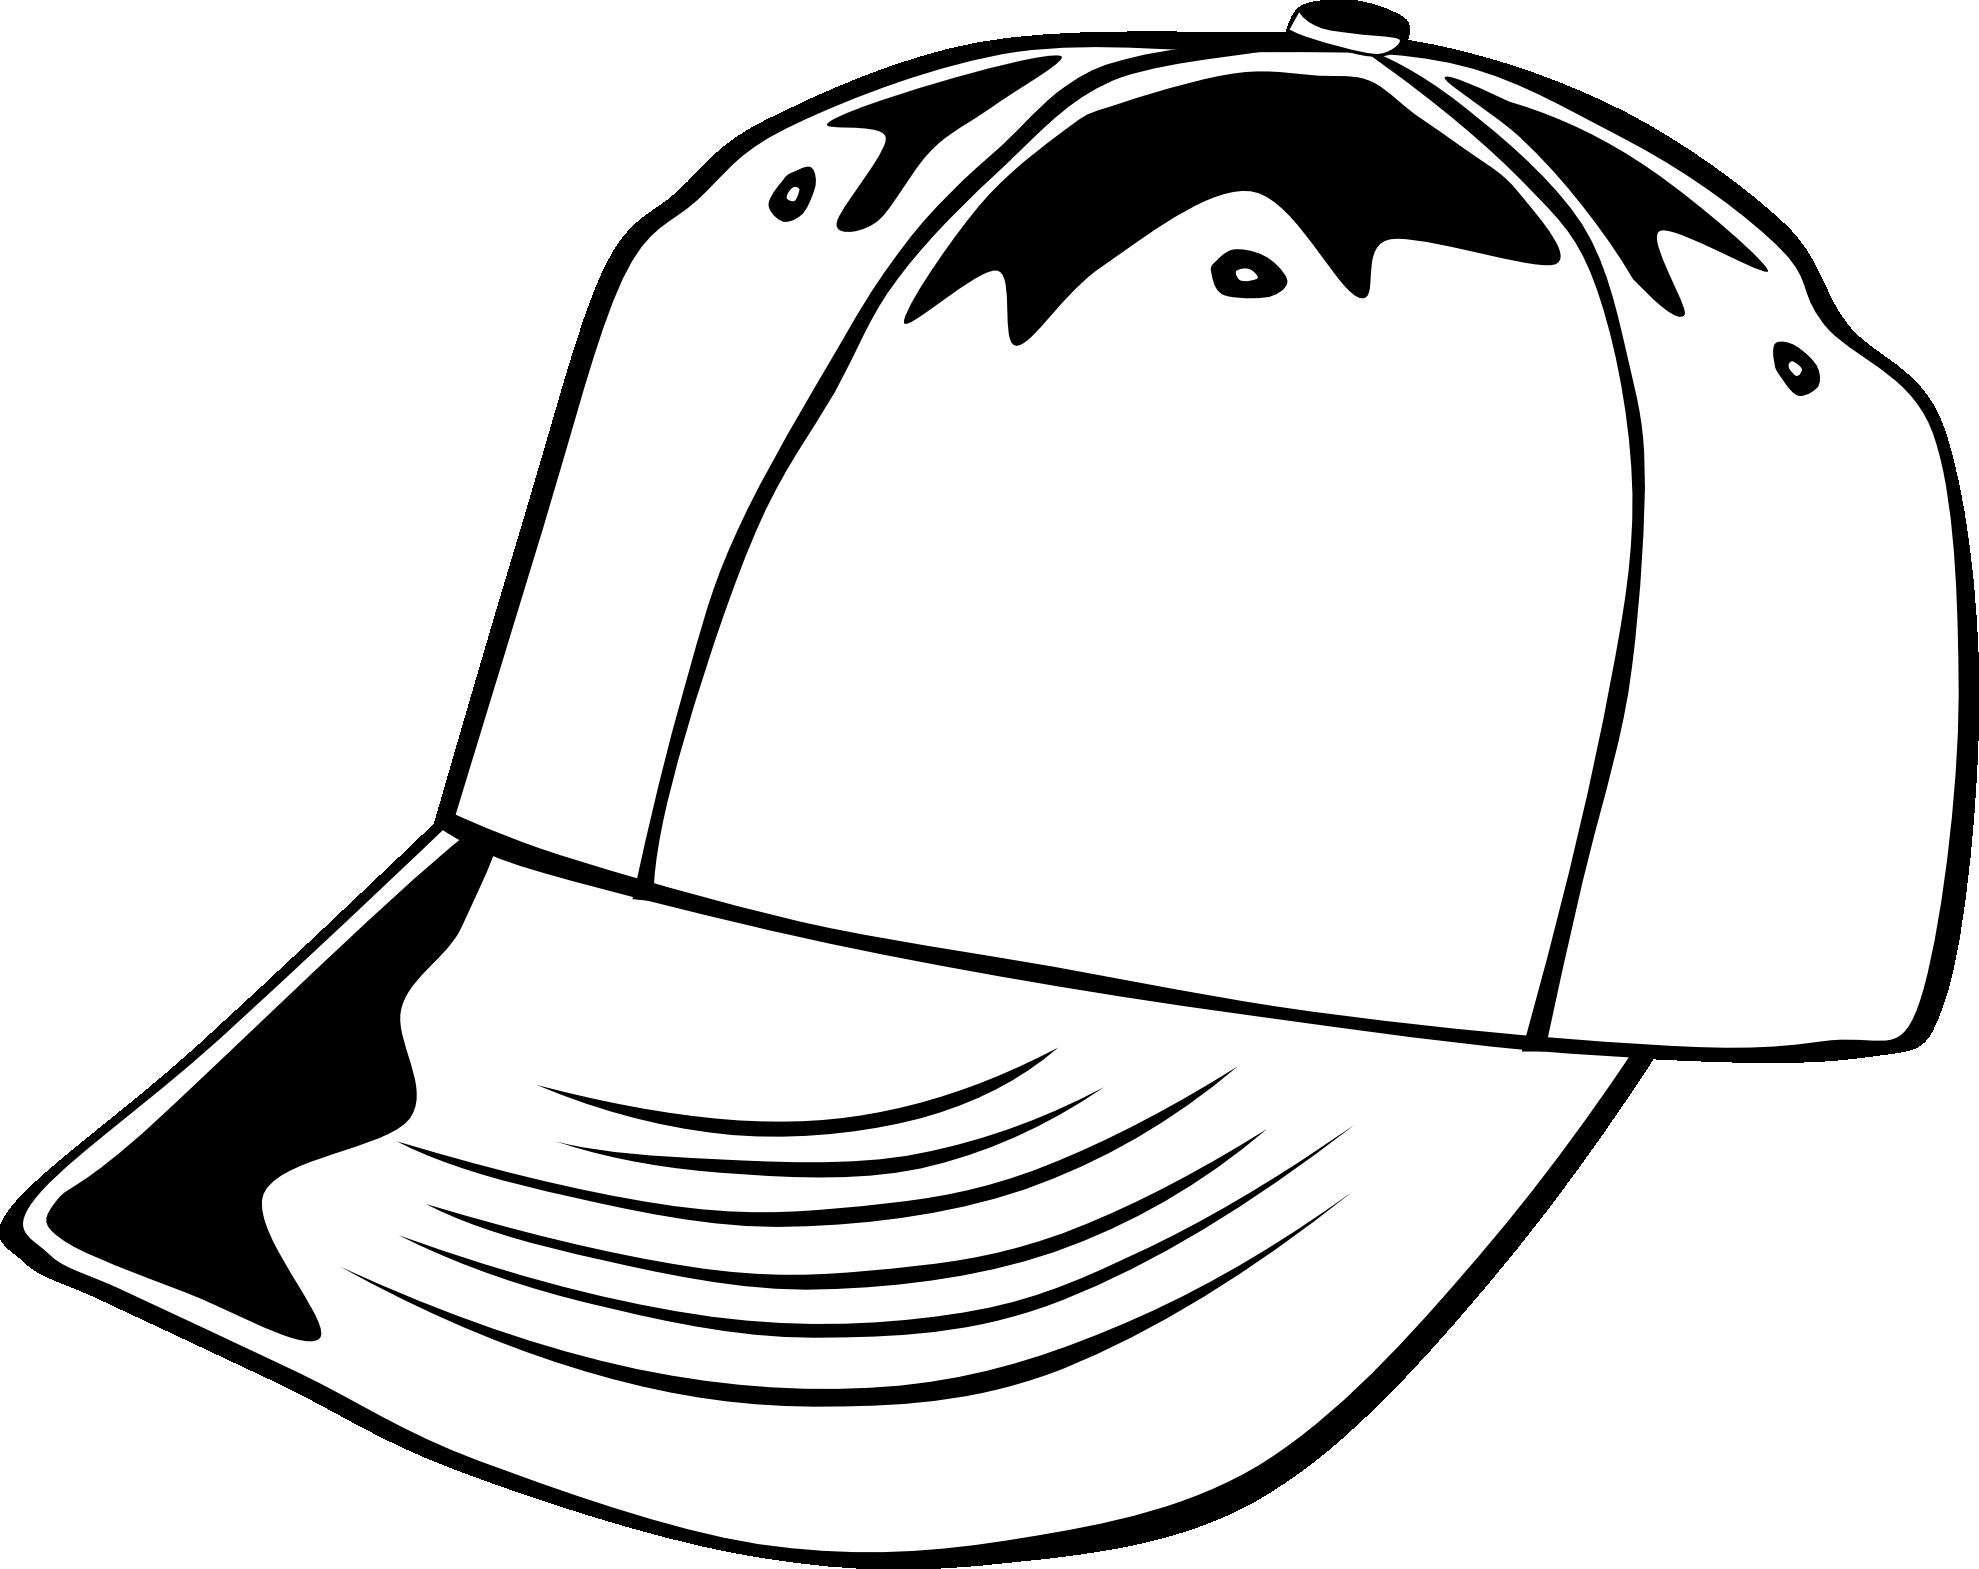 baseball%20clipart%20black%20and%20white